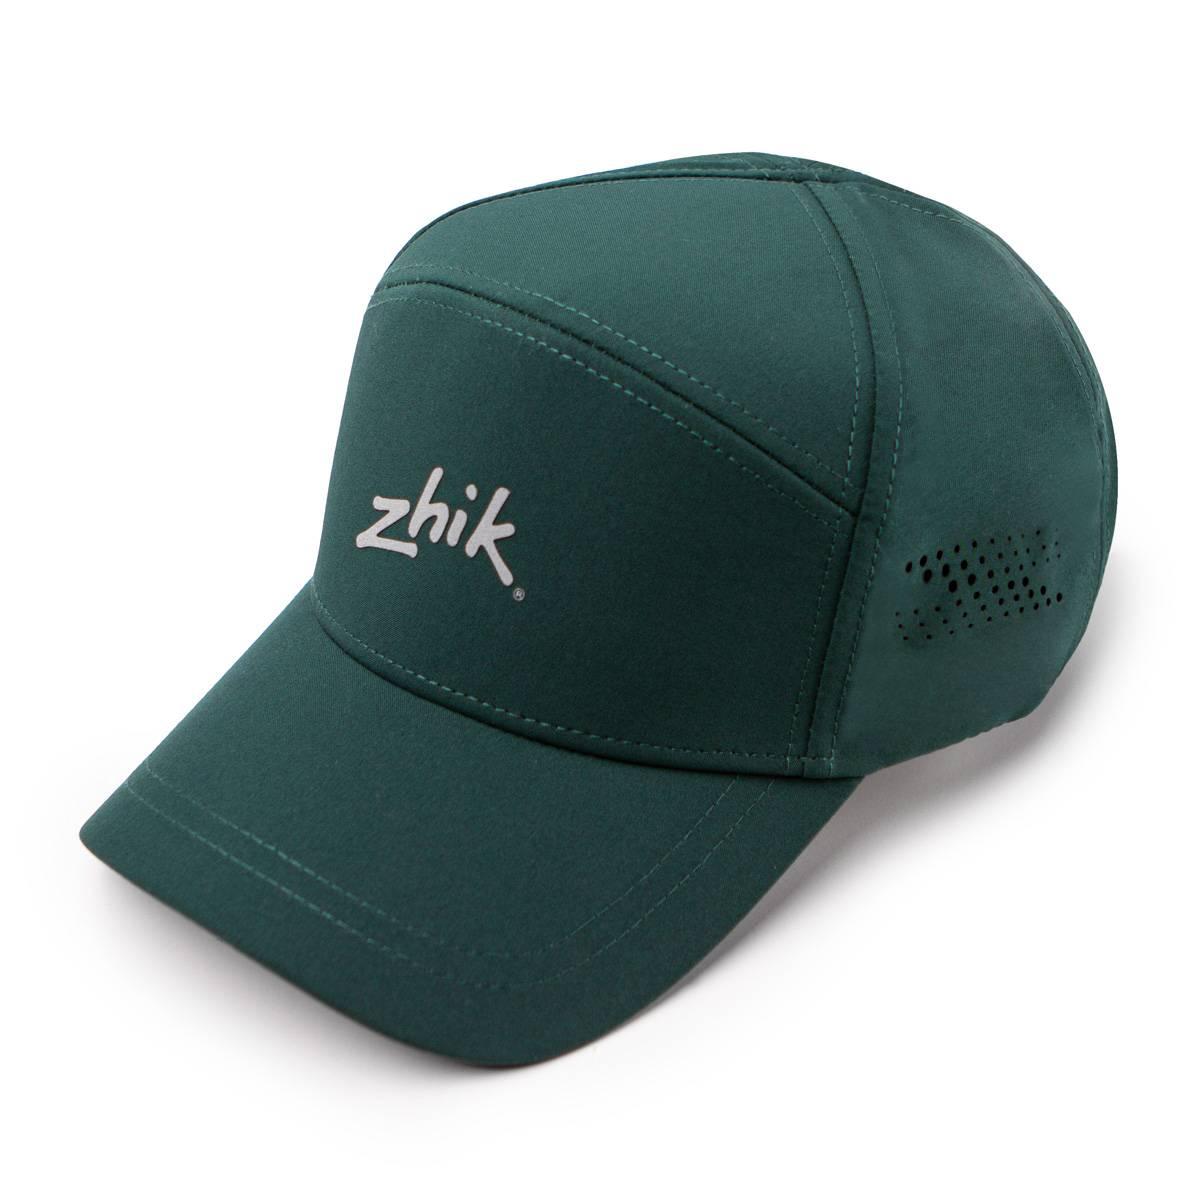 Zhik Sports Cap